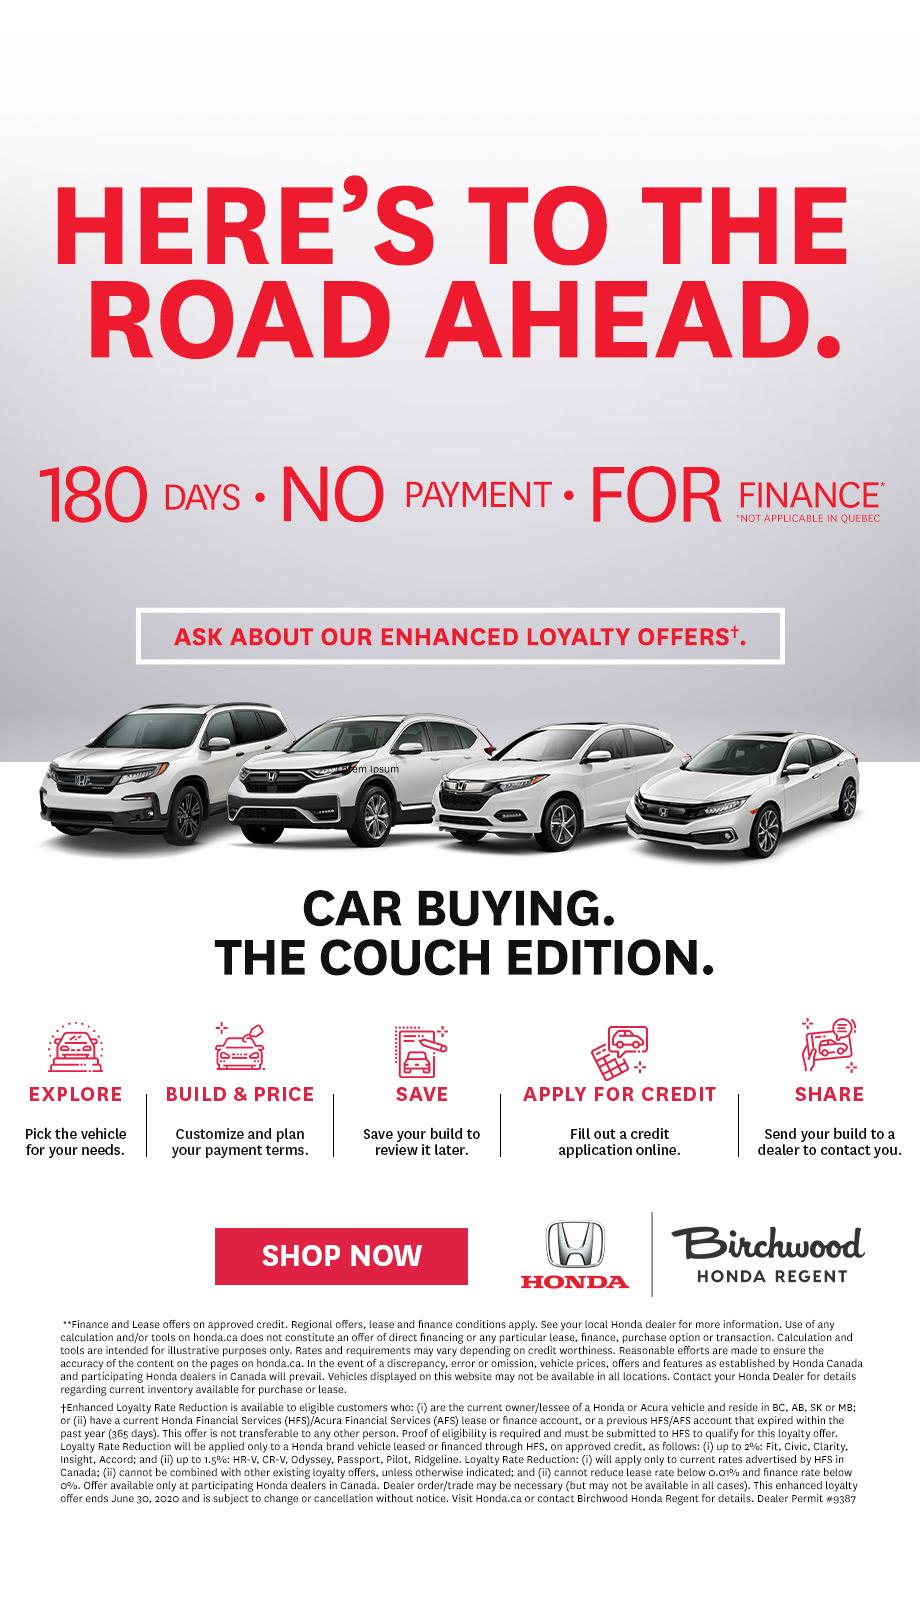 Here's To The Road Ahead Birchwood Honda Regent